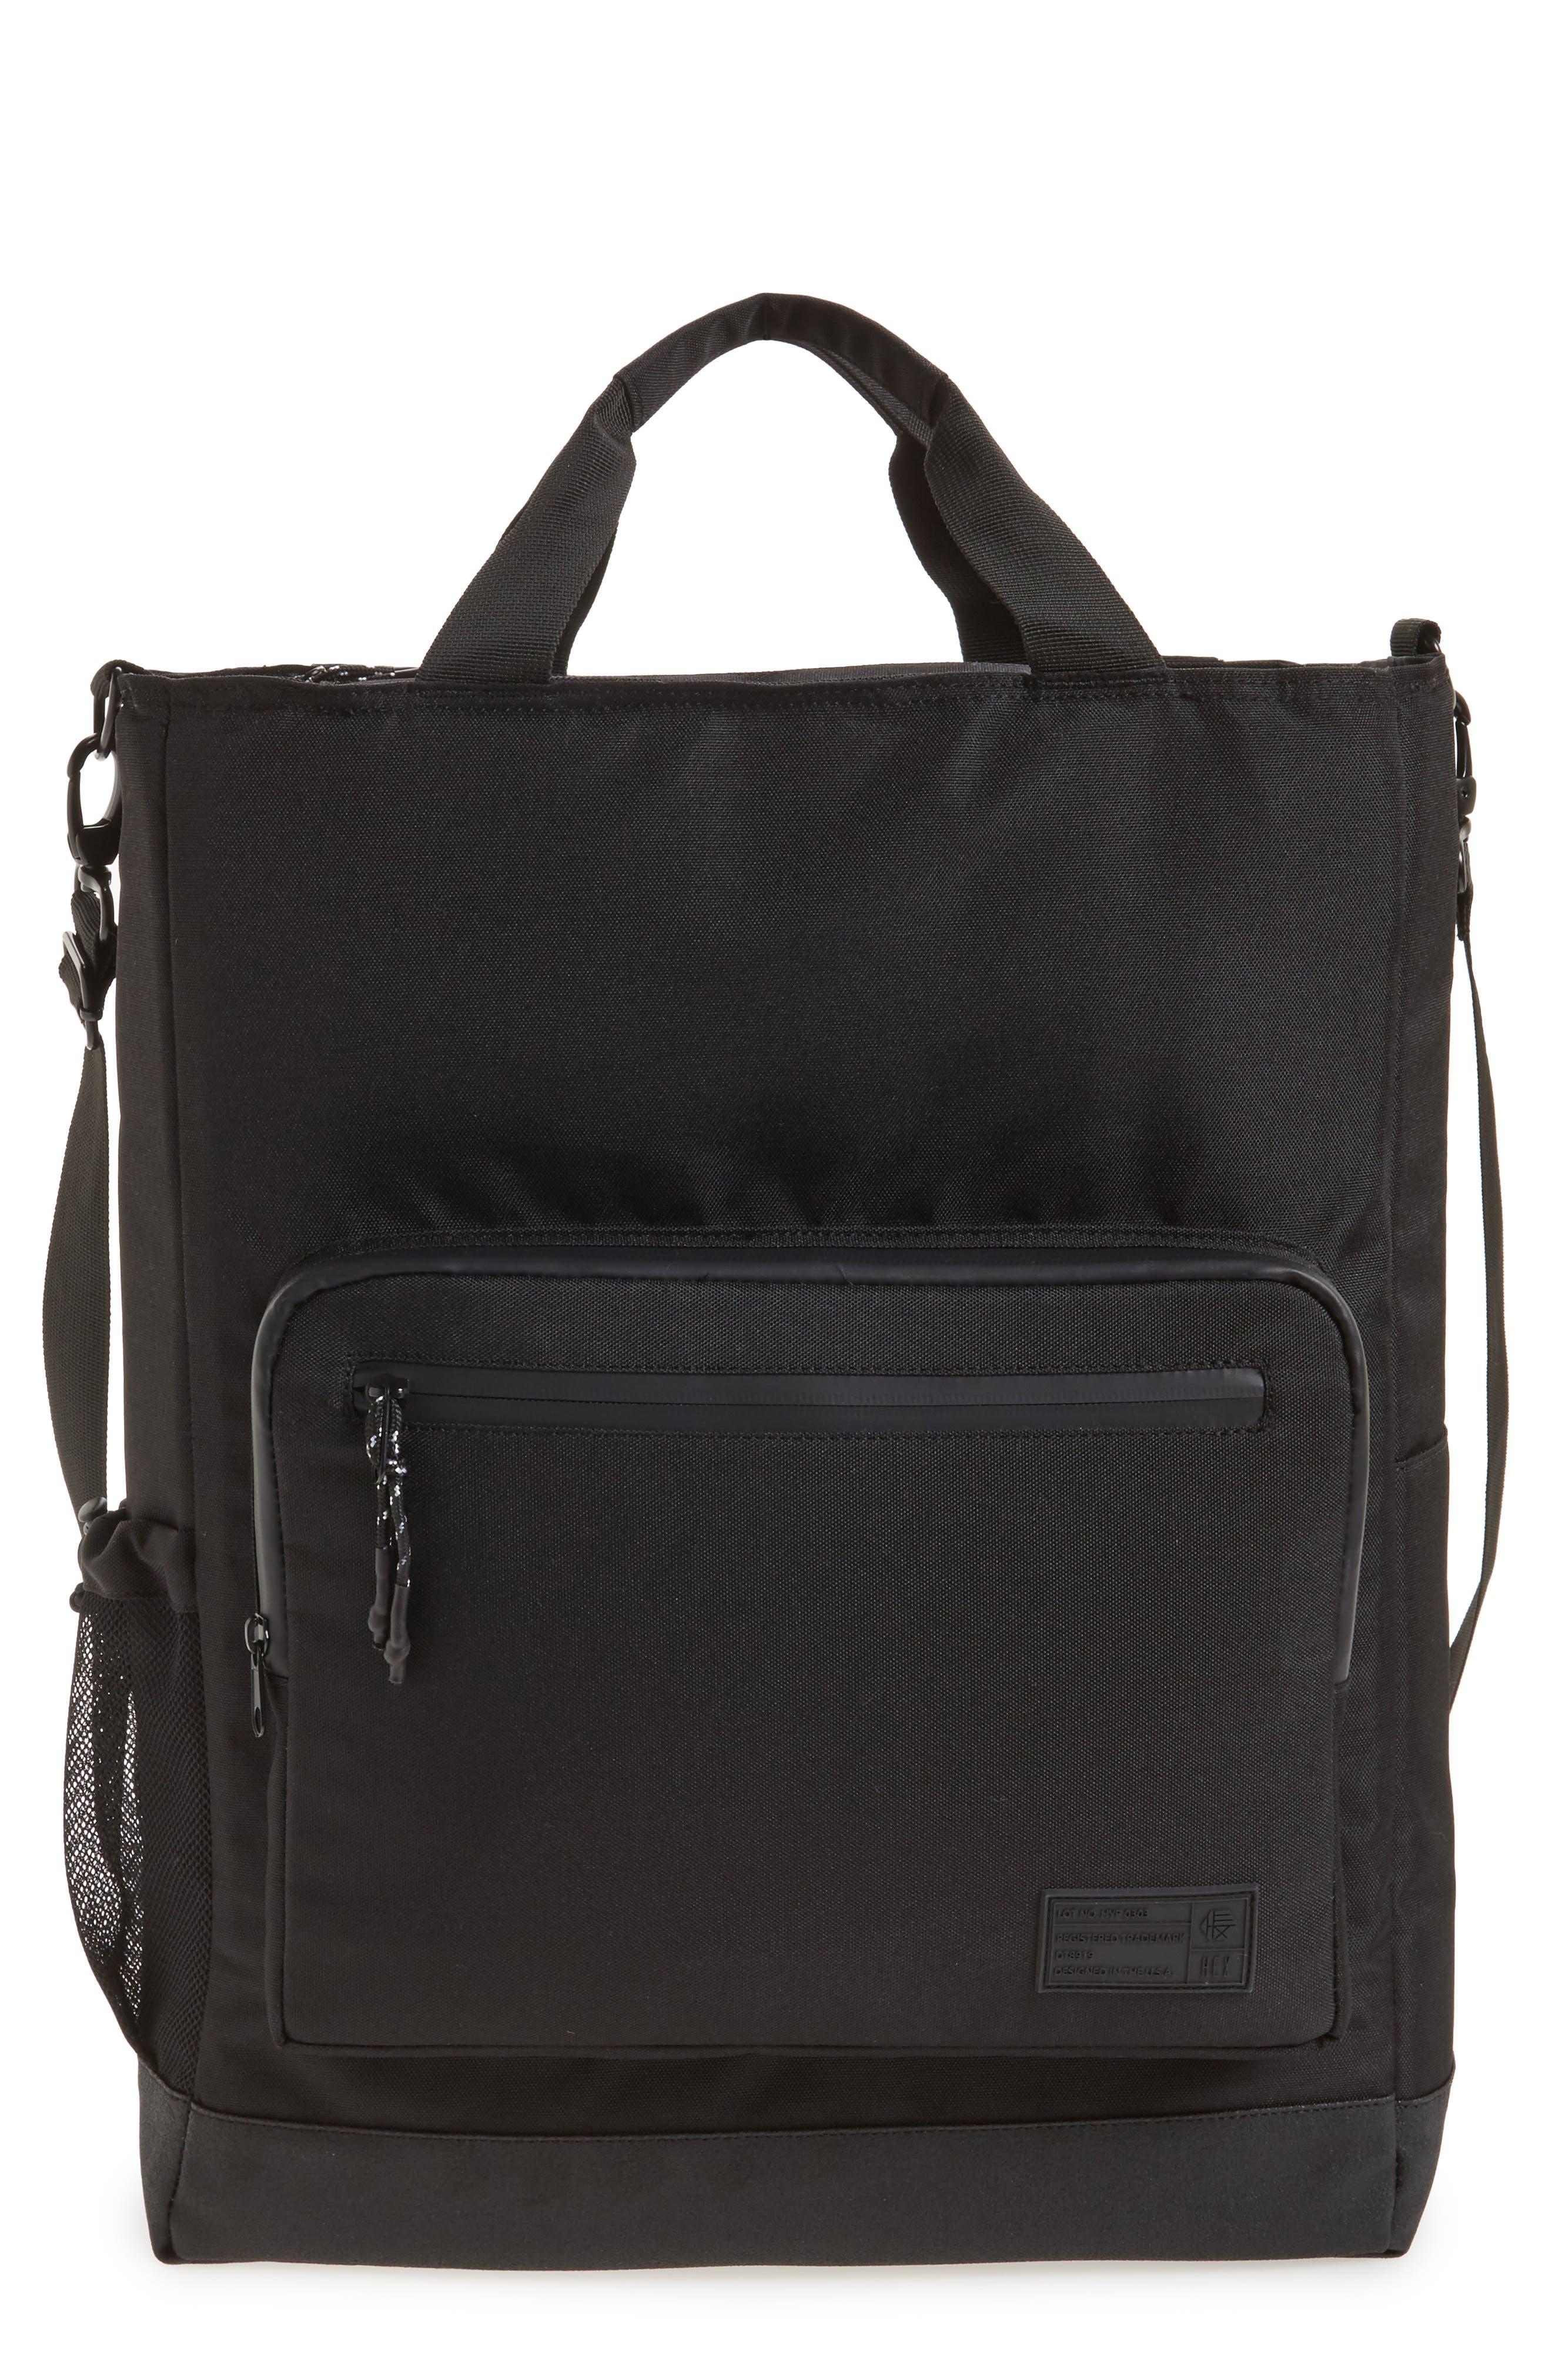 Main Image - HEX Surf Tote Bag